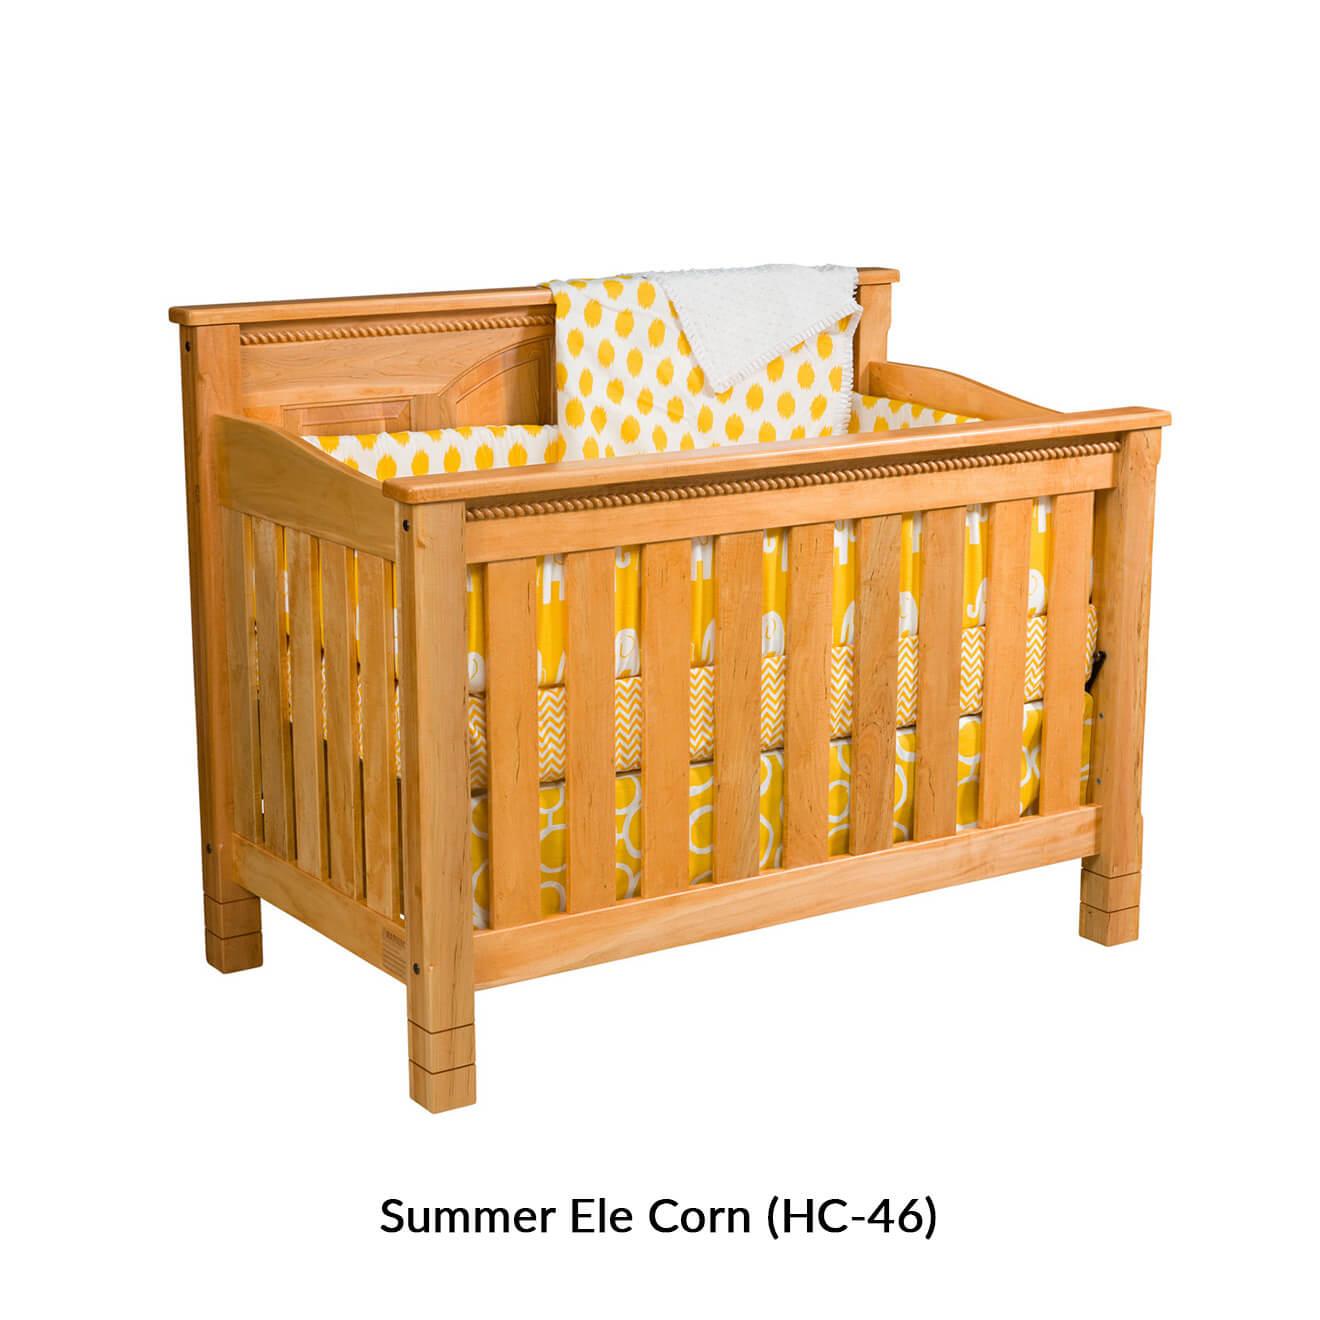 29.-summer-ele-corn-hc-46-.jpg